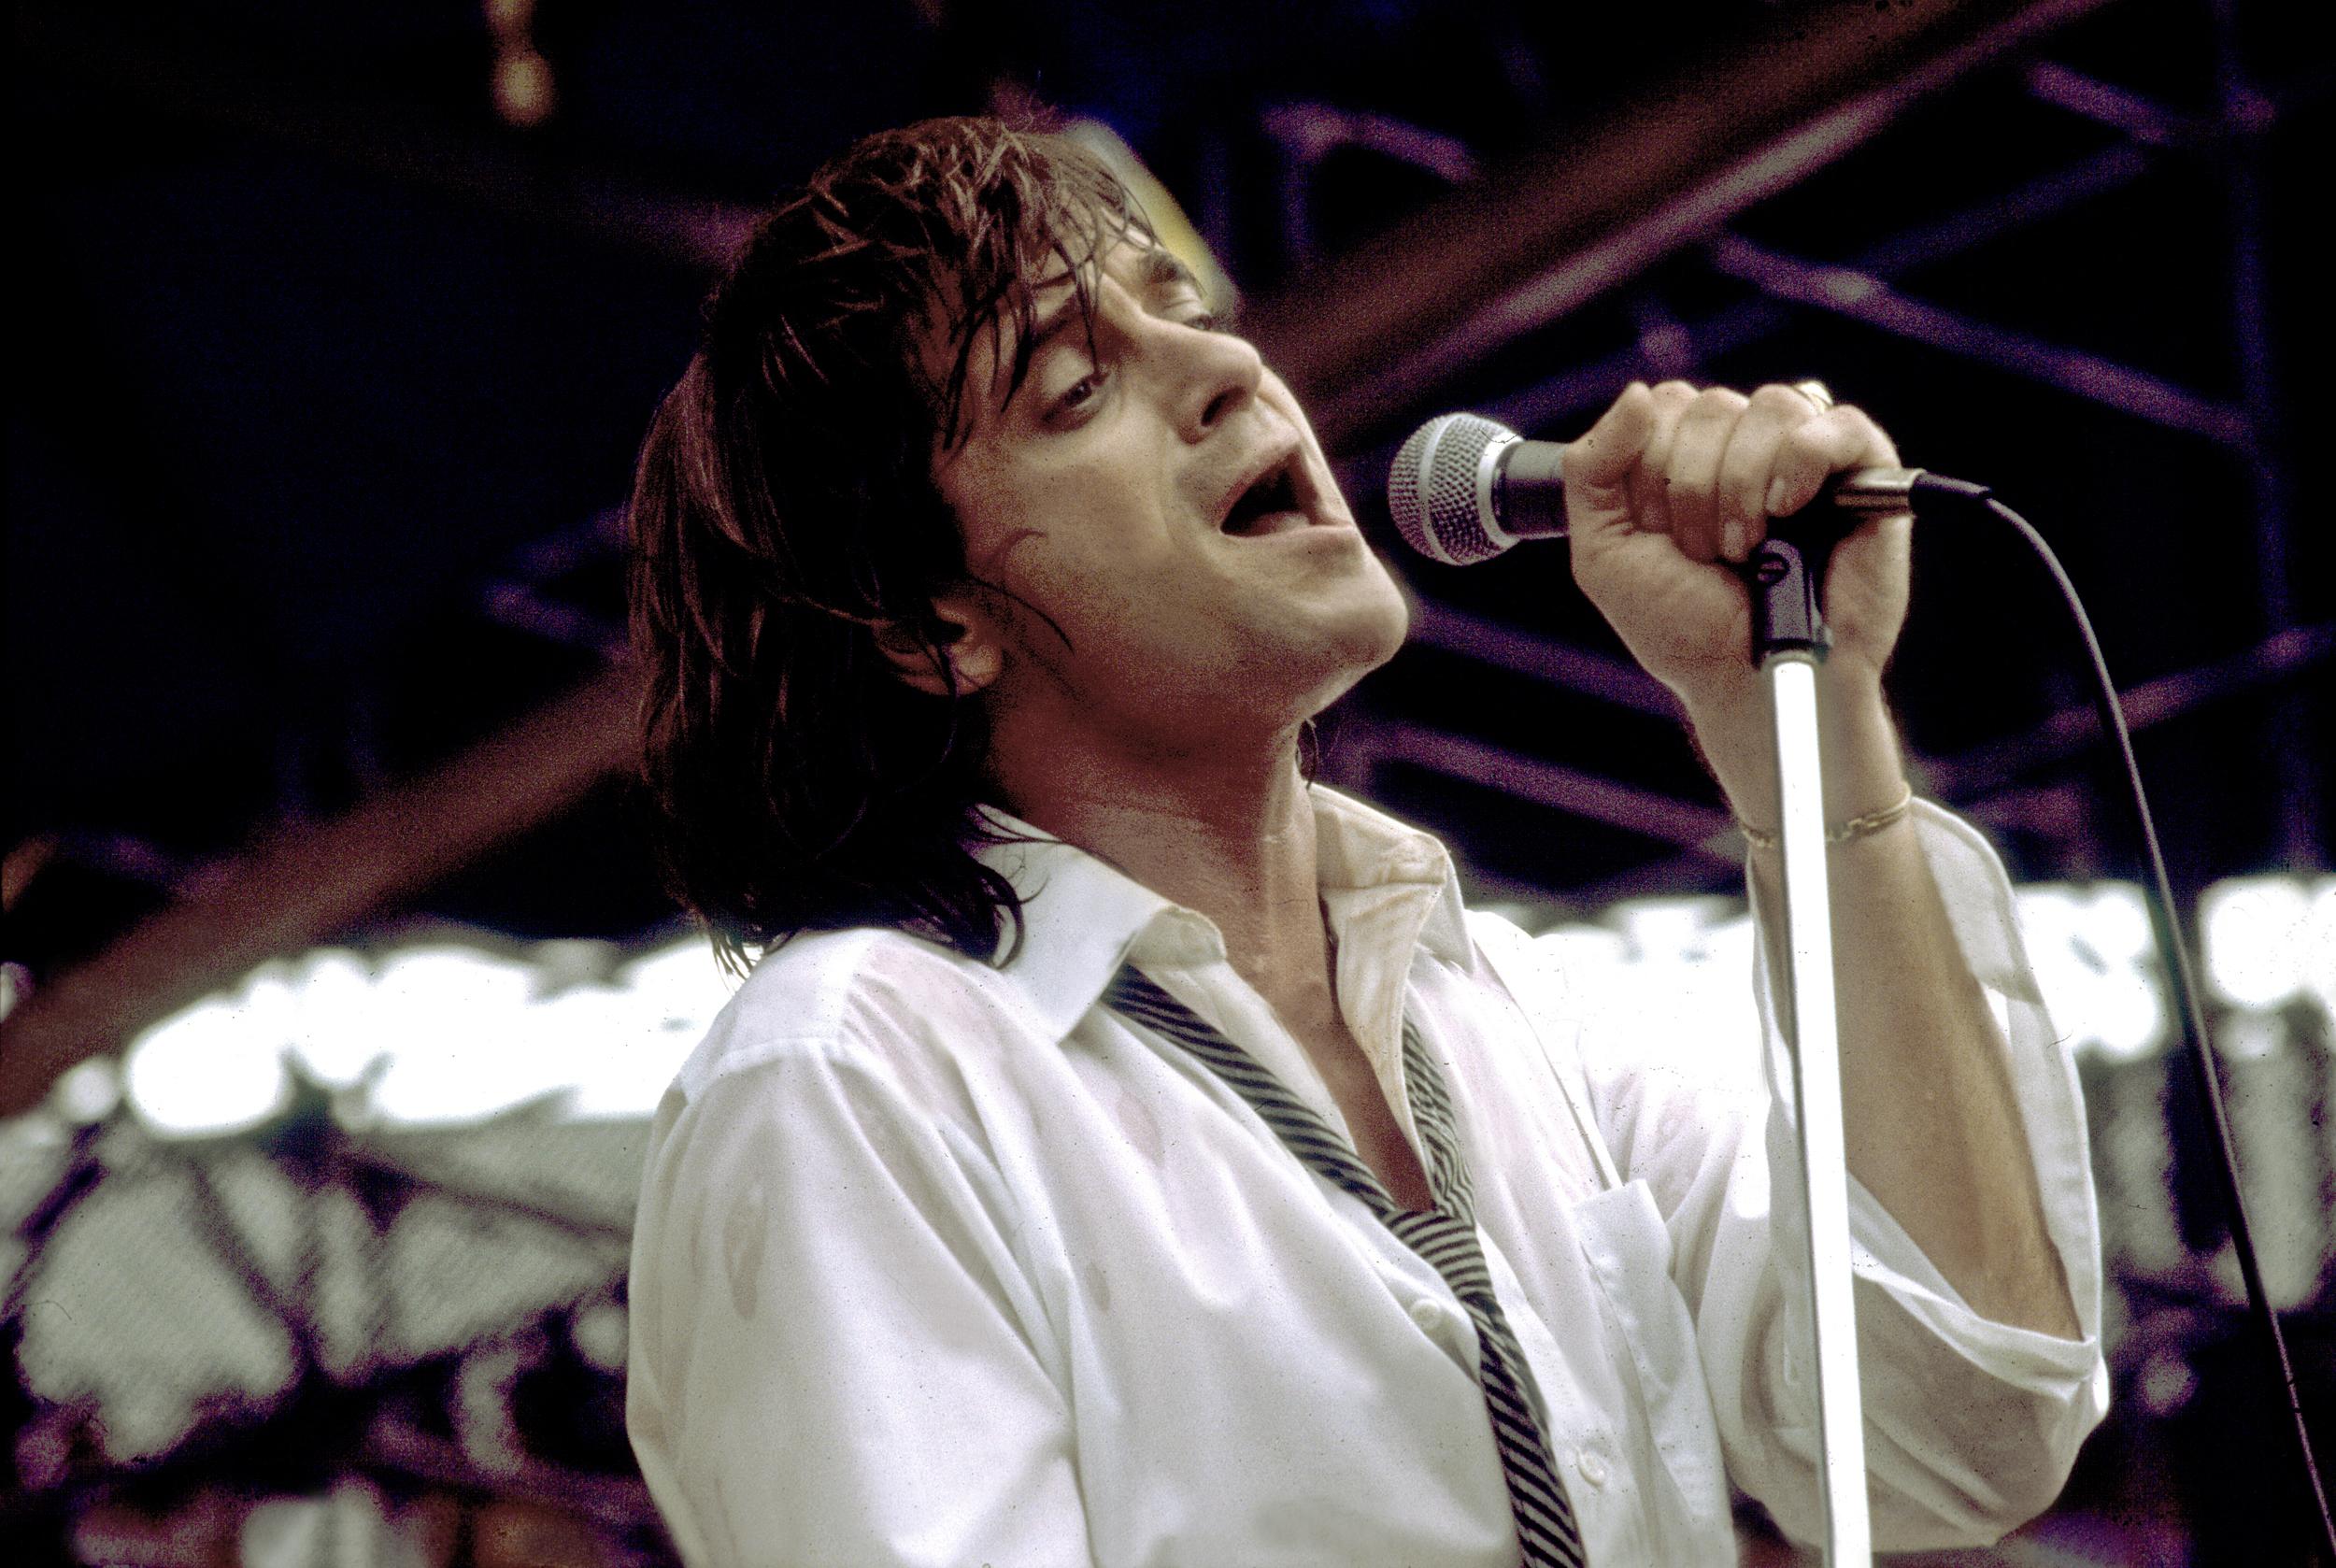 Eddie-Money,-'Two-Tickets-to-Paradise'-singer,-dies-at-70